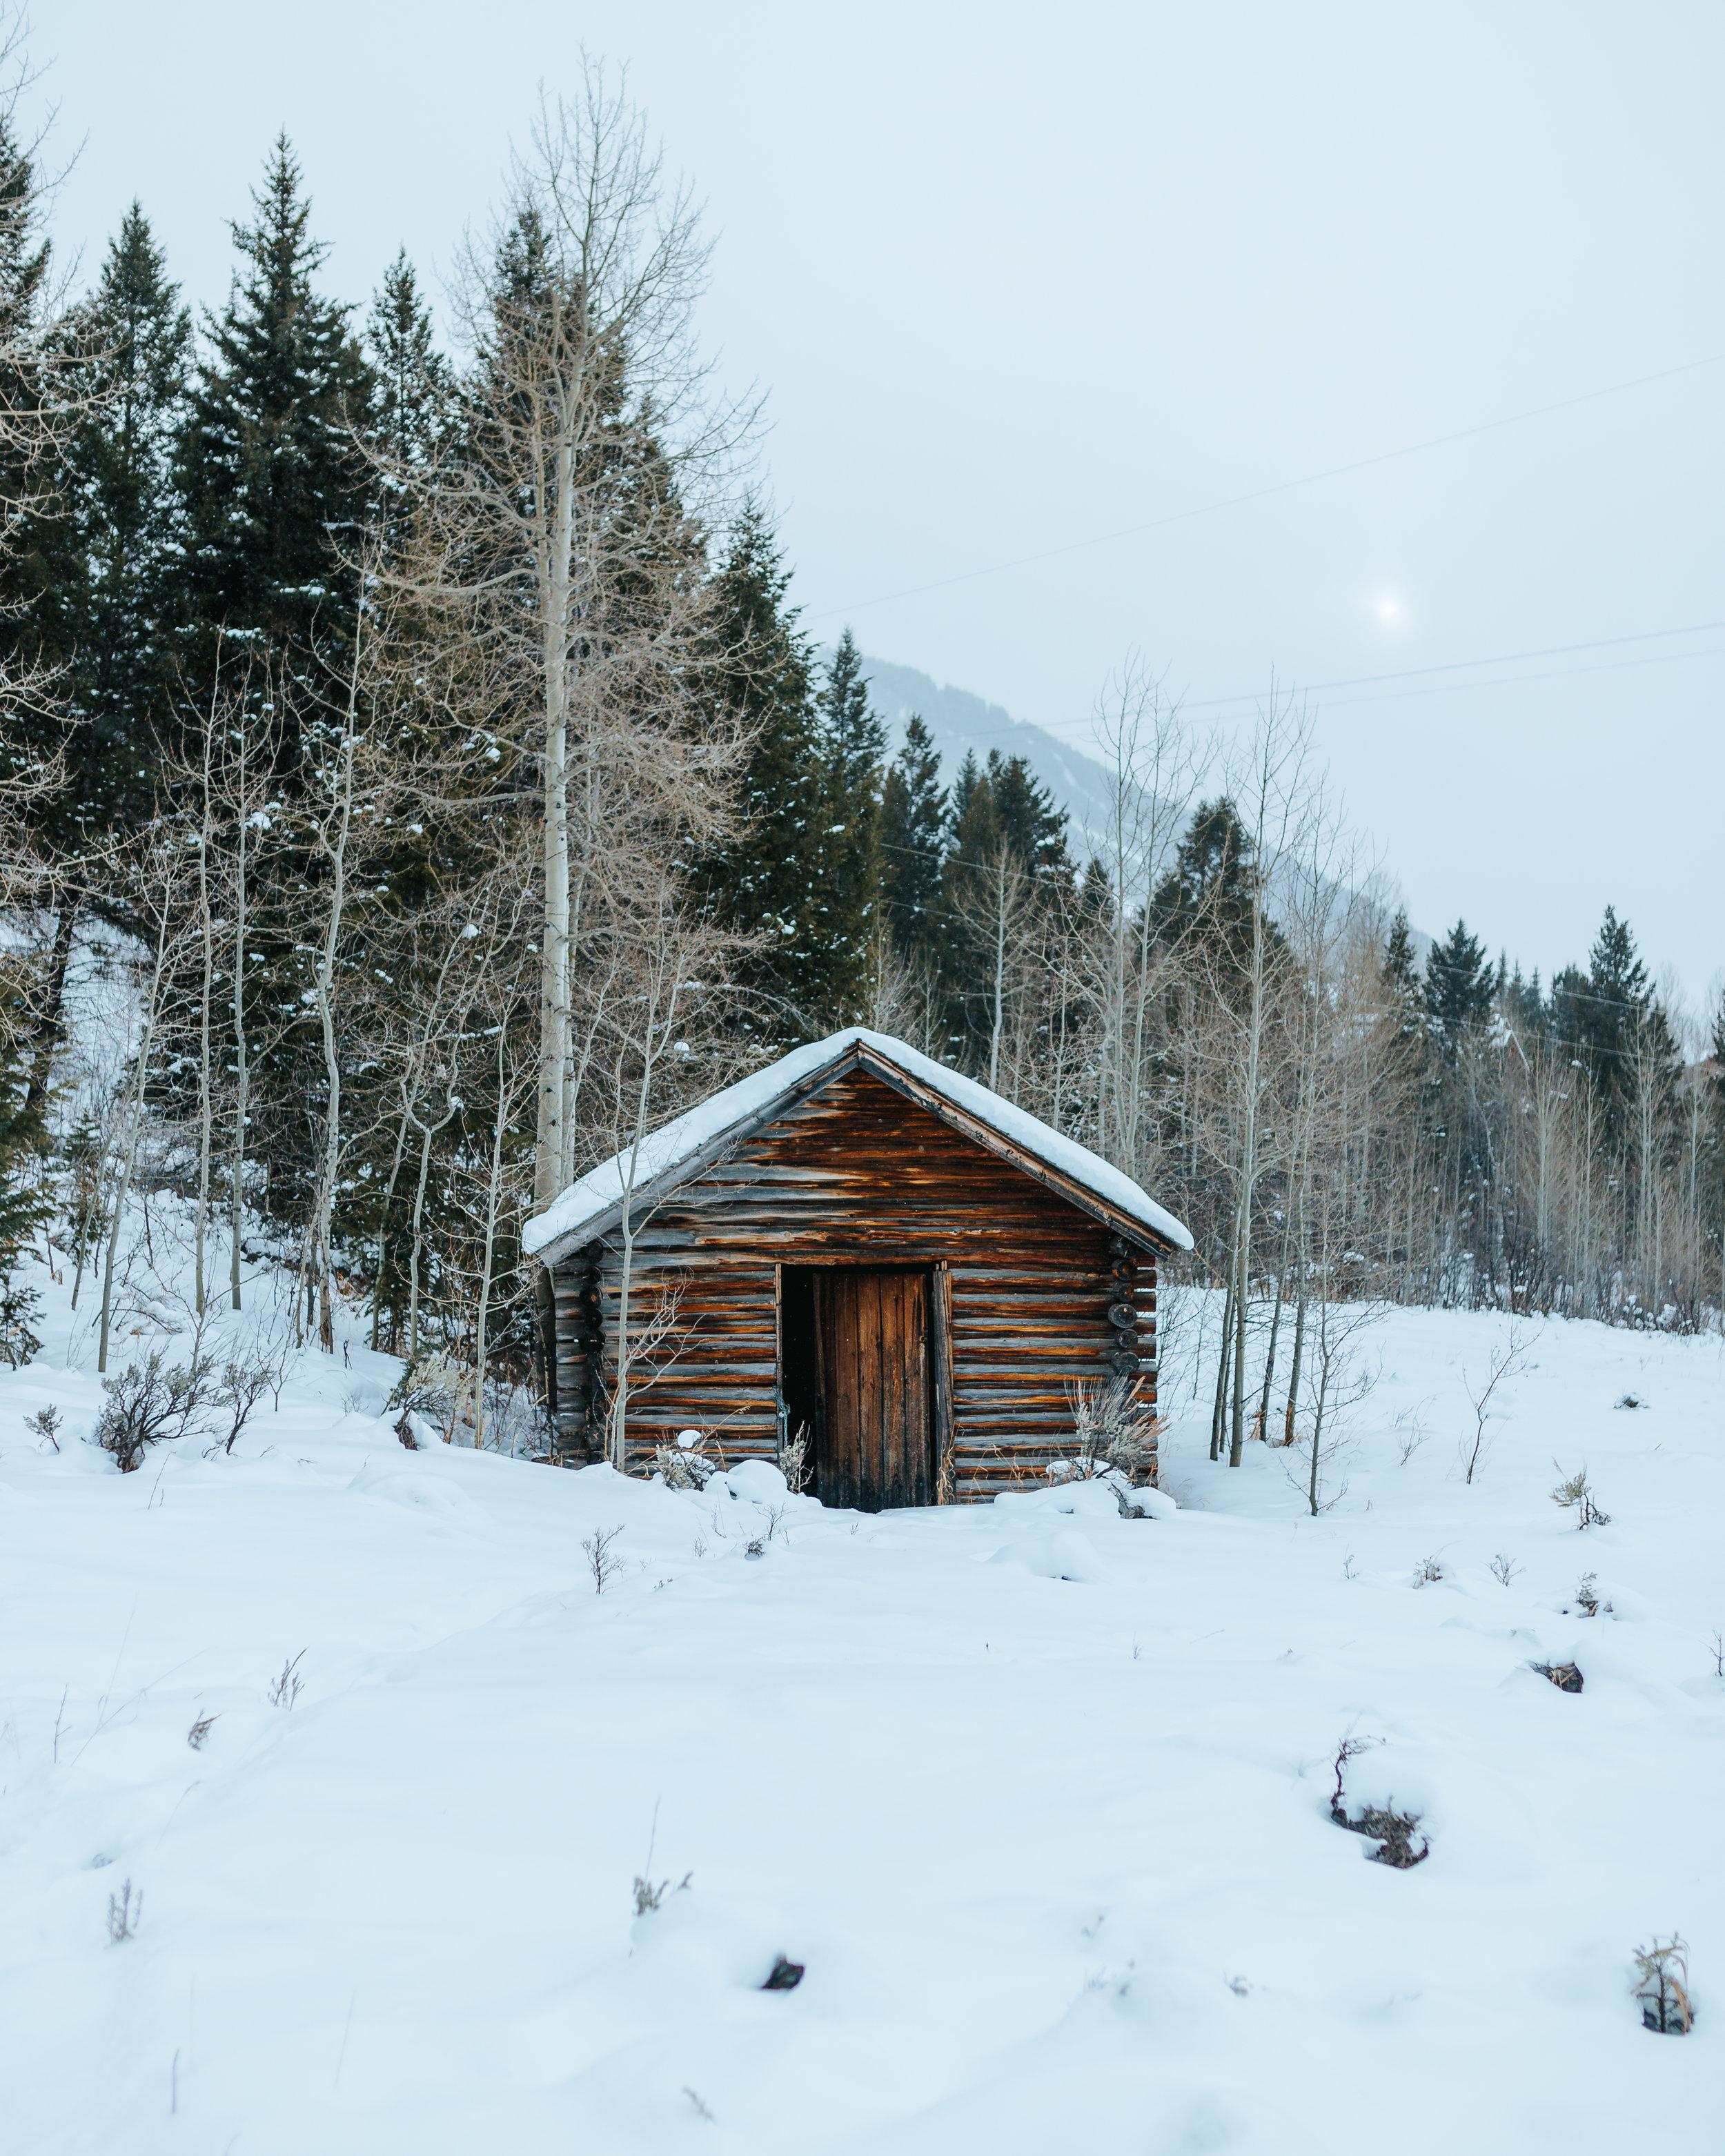 GretaEagan_Refuge&Cabin_02-25-18-7.jpg